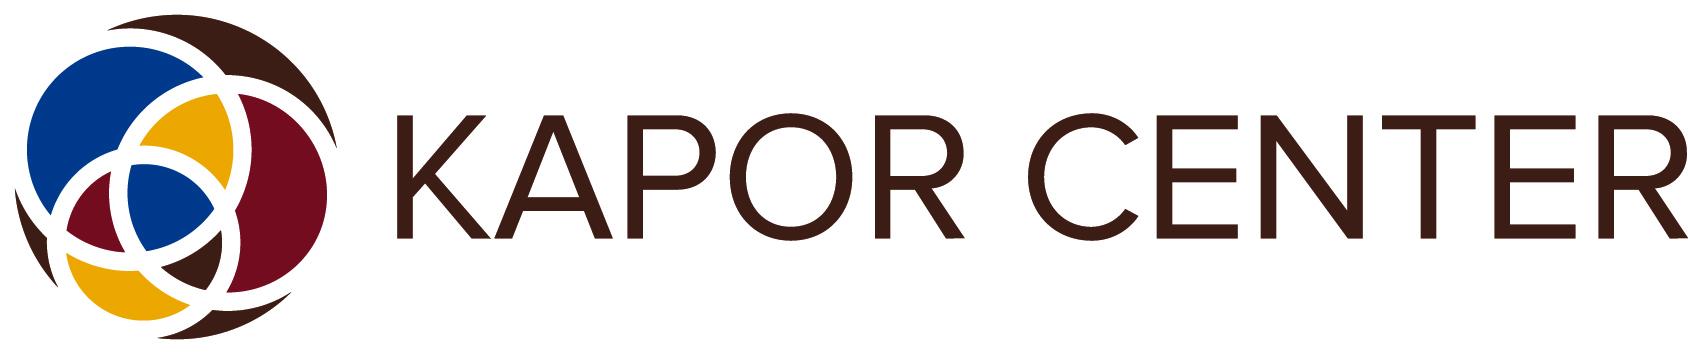 KAPOR_LOGO_WHITEBACKGROUND.jpg